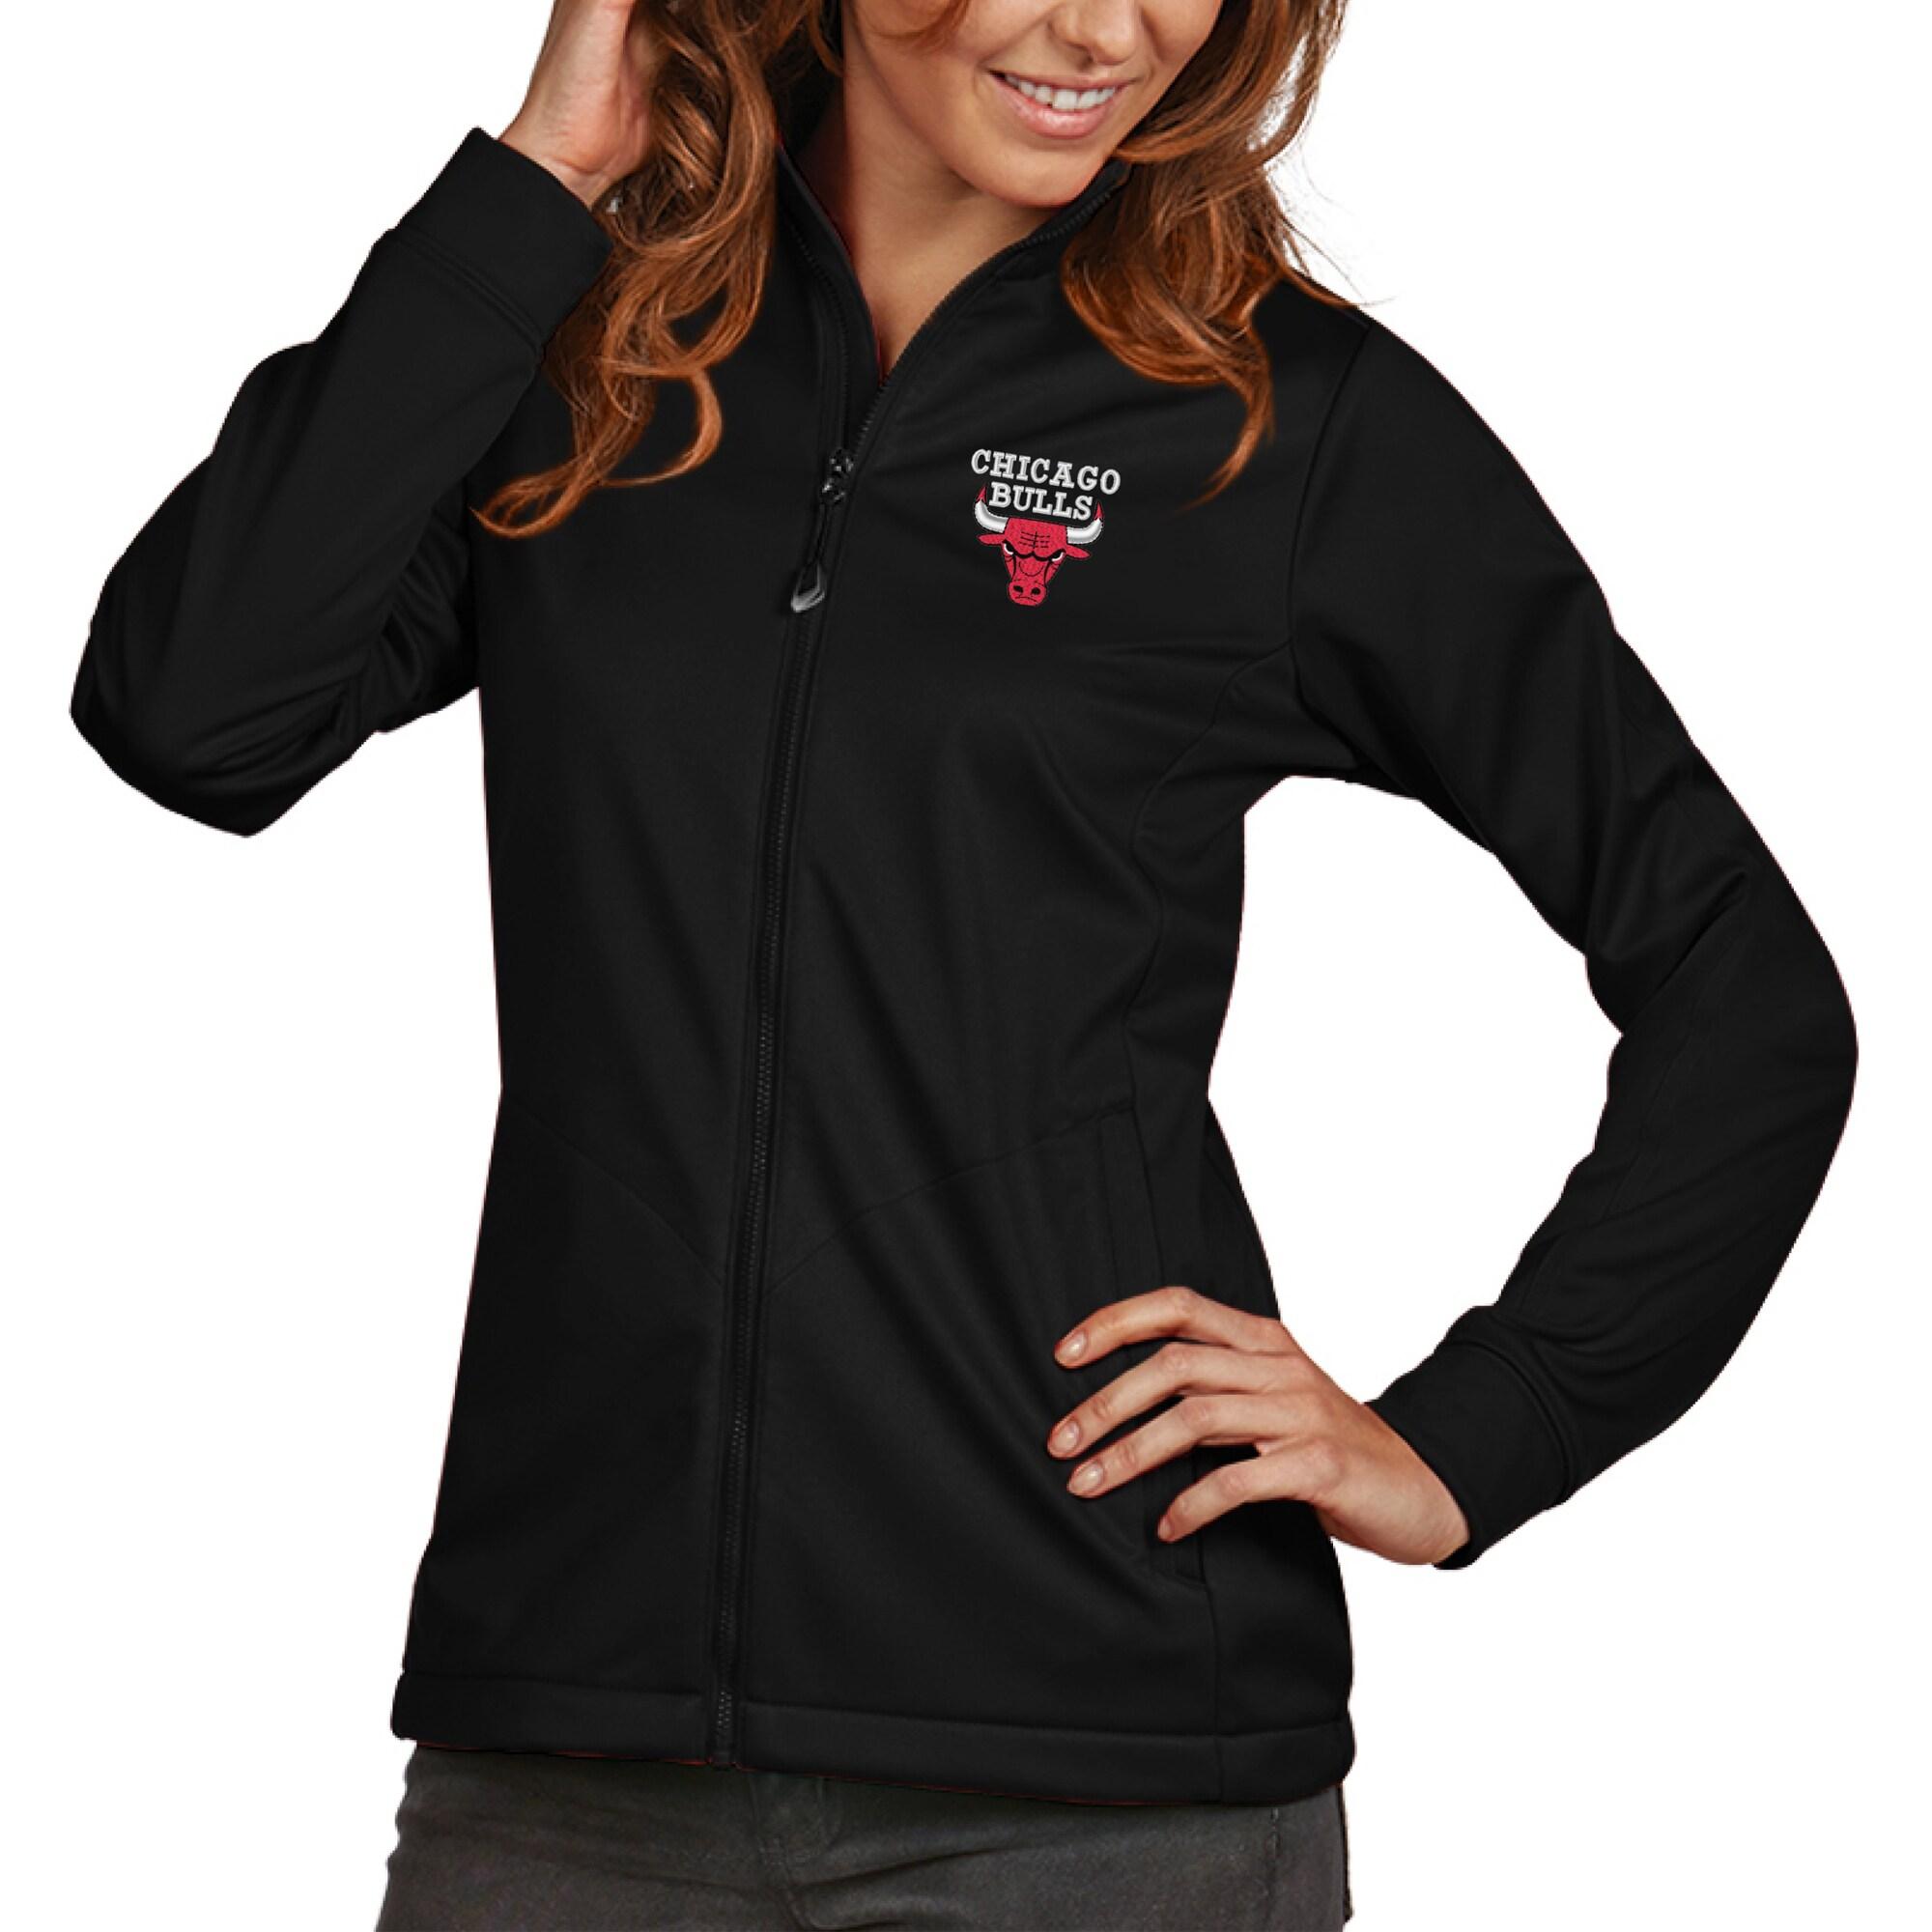 Chicago Bulls Antigua Women's Golf Full-Zip Jacket - Black